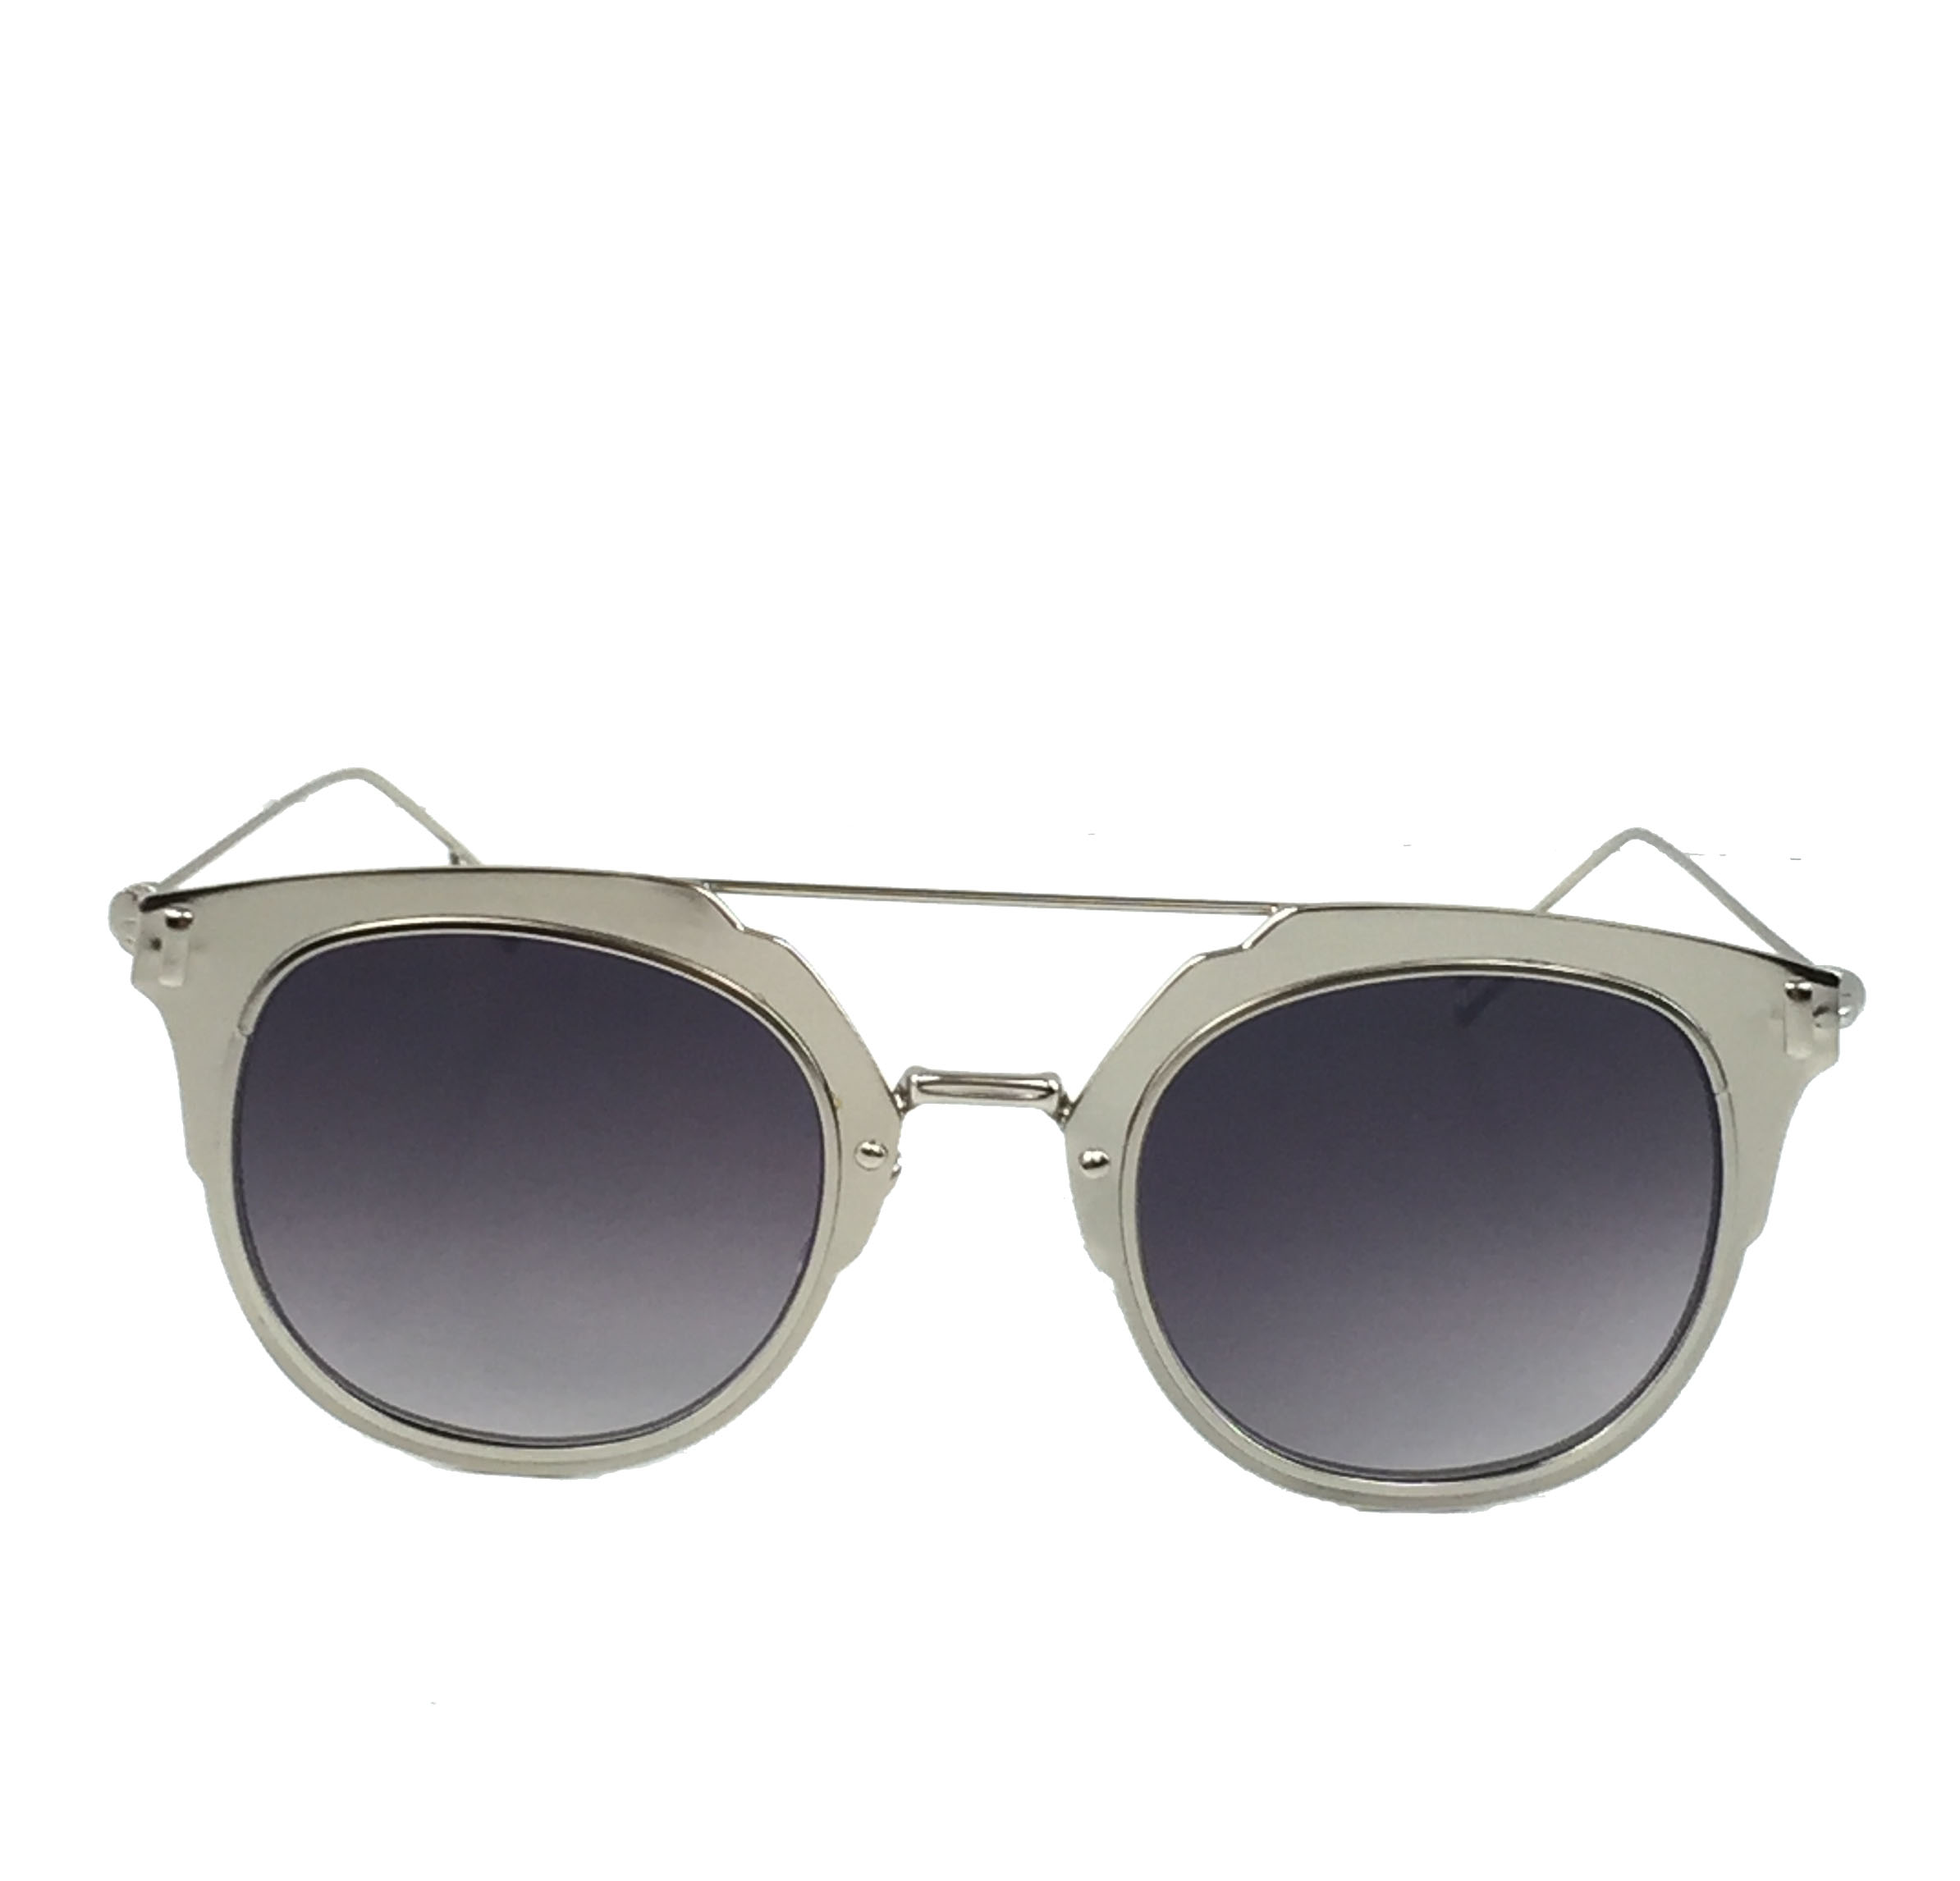 Huxley and Grace ασημί μεταλλικά γυαλιά HG3012B 2444ae6888f